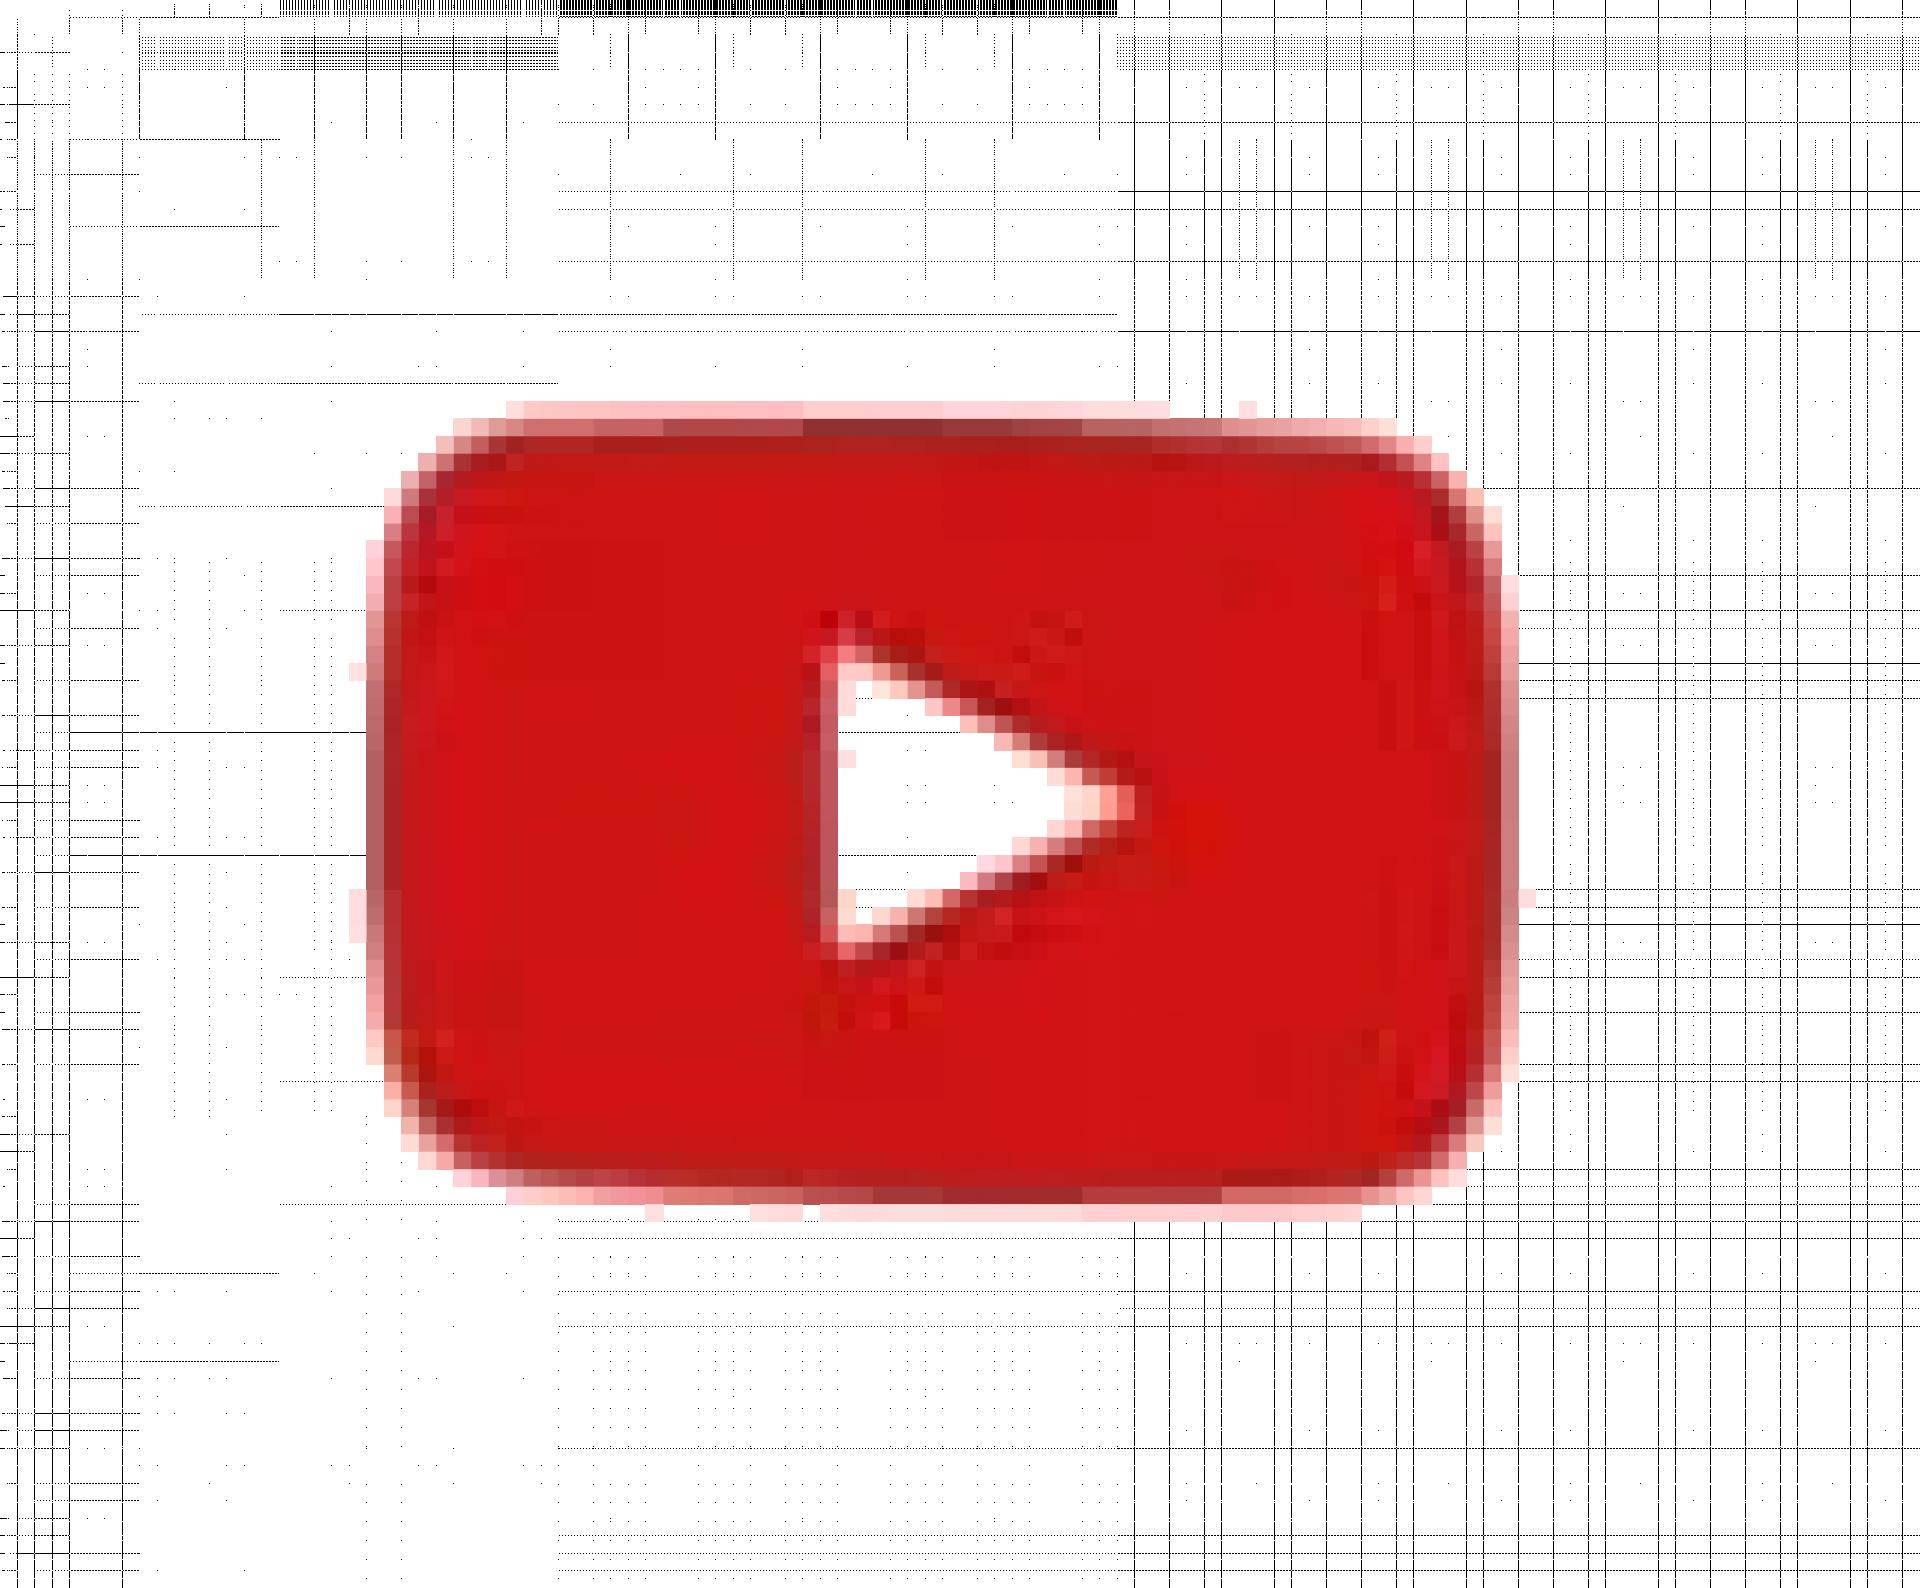 Youtube kanál Zoo Hluboká